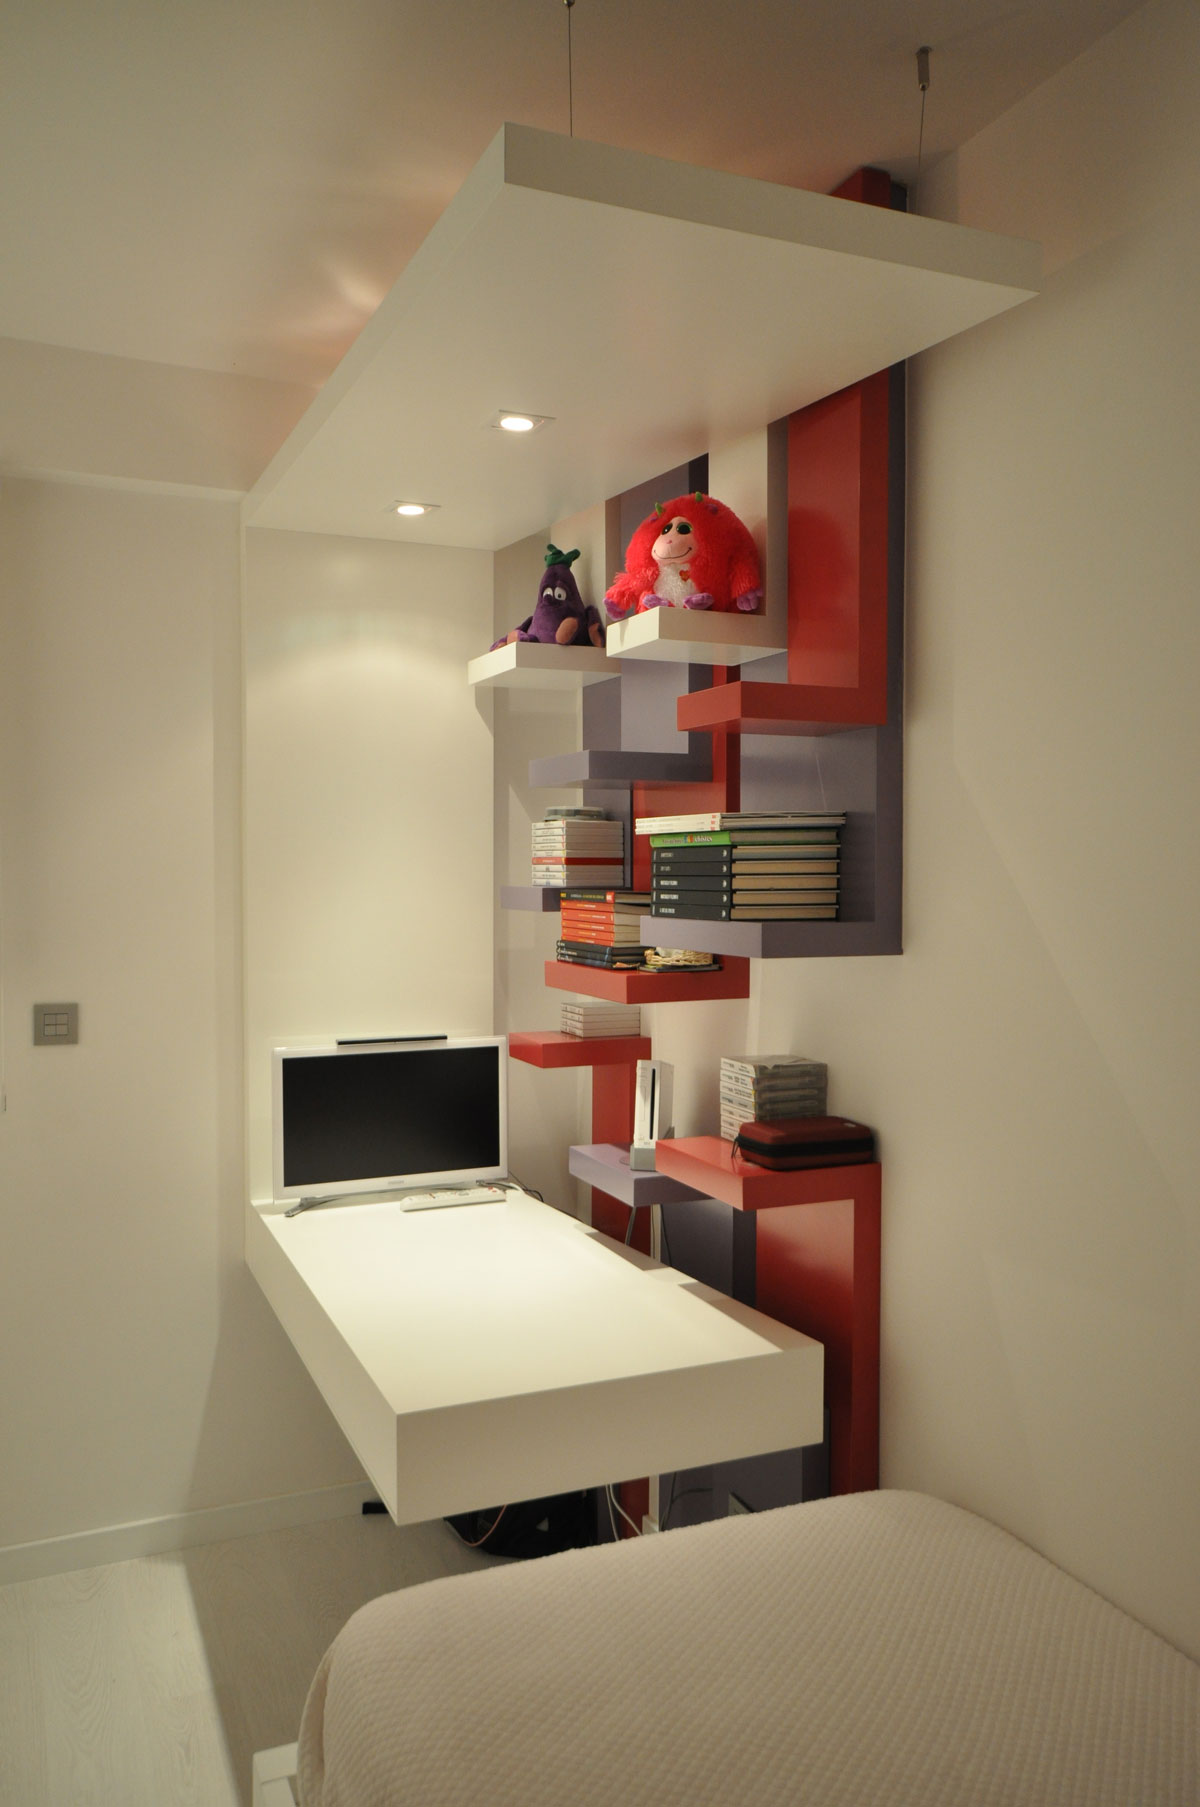 Dise o de dormitorios juveniles estudio arinni for Diseno de interiores habitaciones juveniles